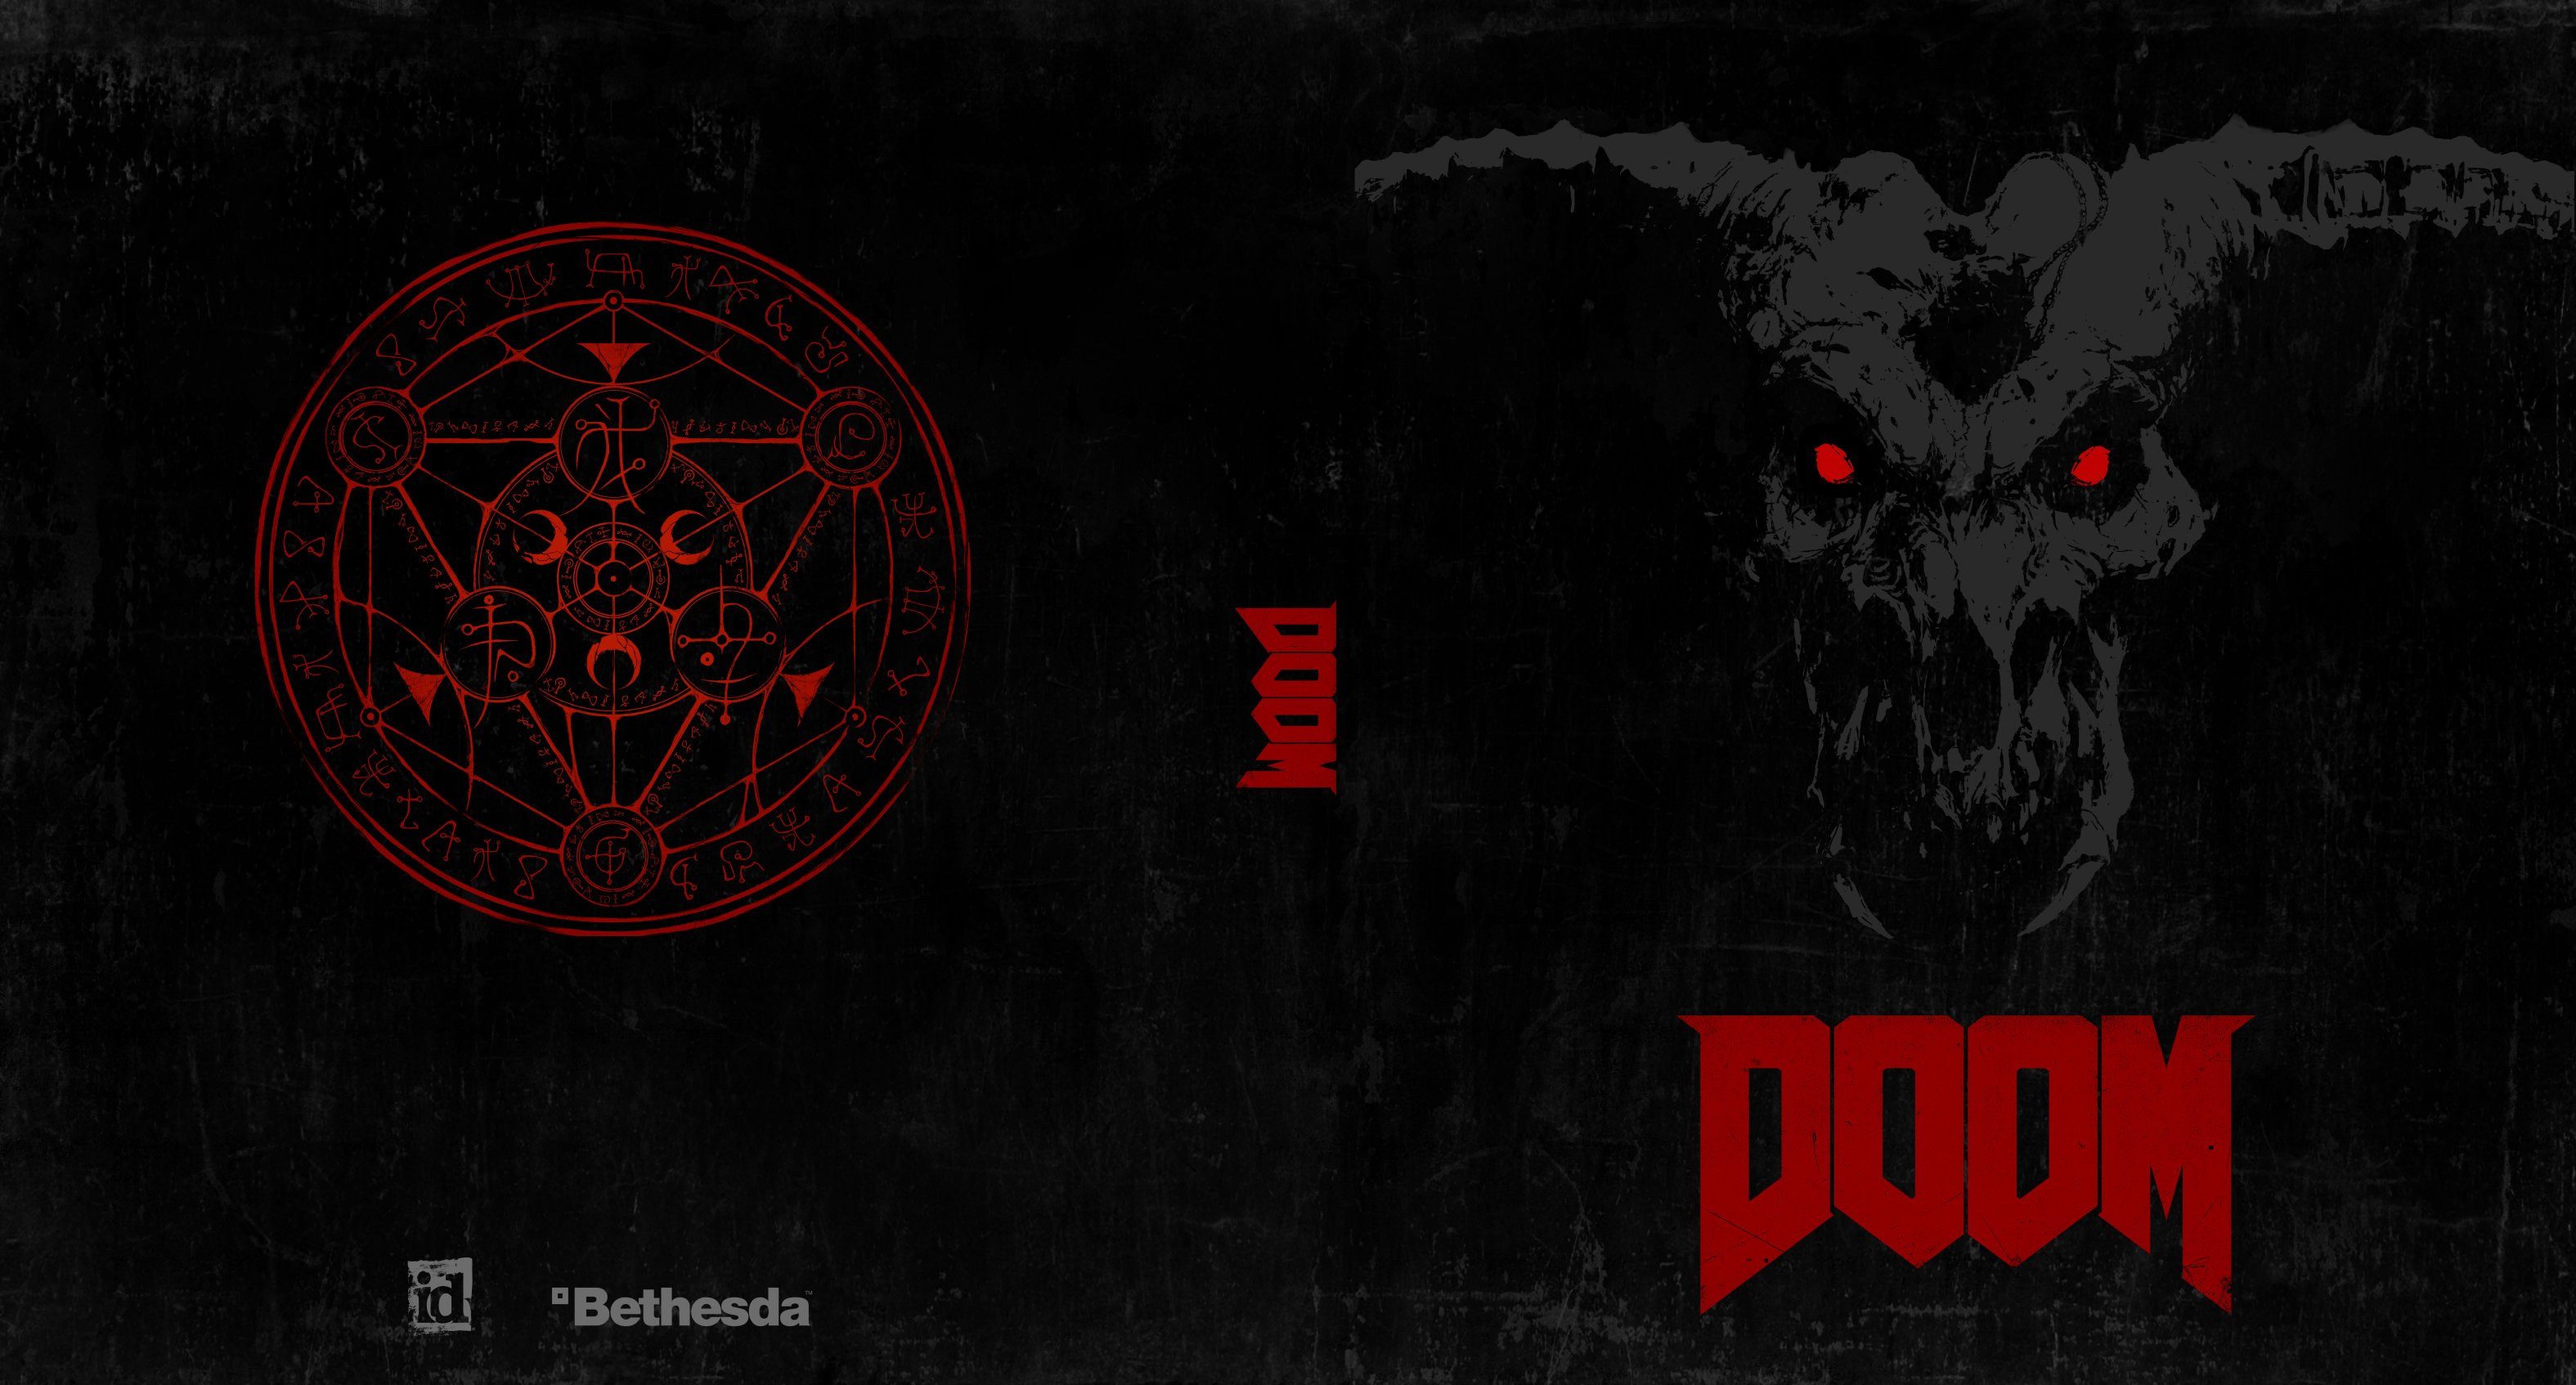 doom-wendecover-platz-2